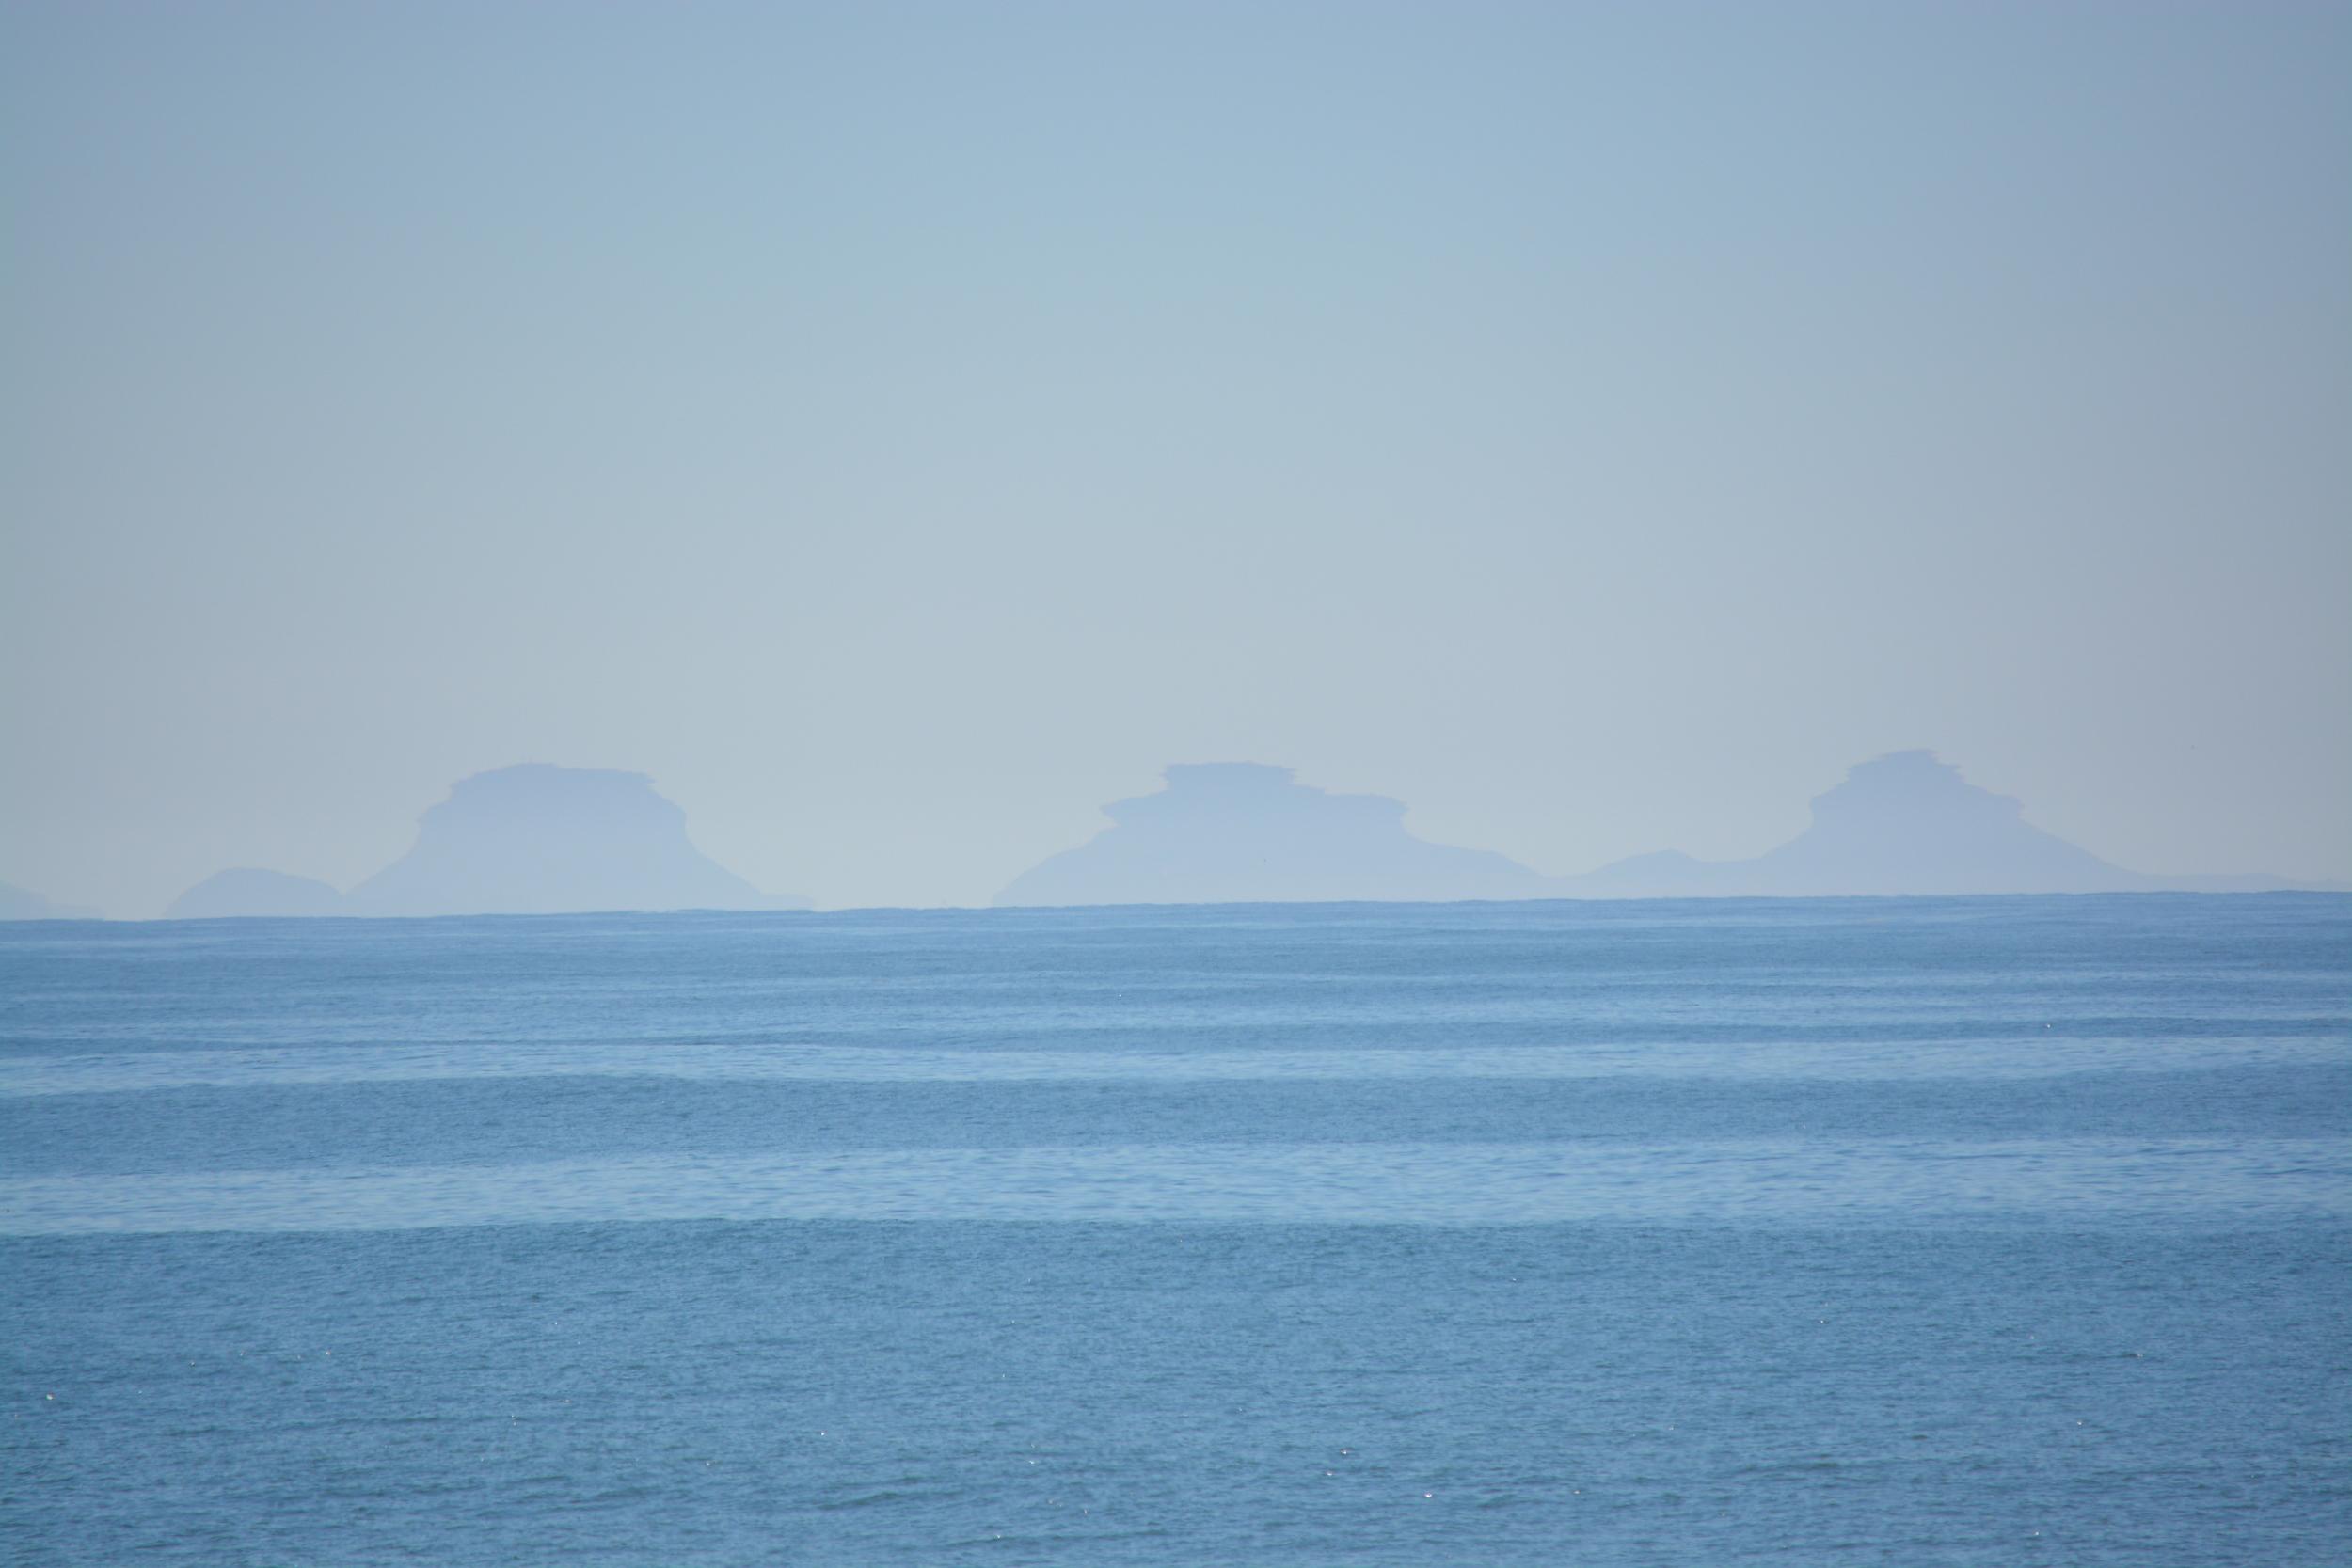 Baja California 10-5-13 Shipwrecks Surfing Adventure Ocean Experience Surf School San Diego (58).JPG